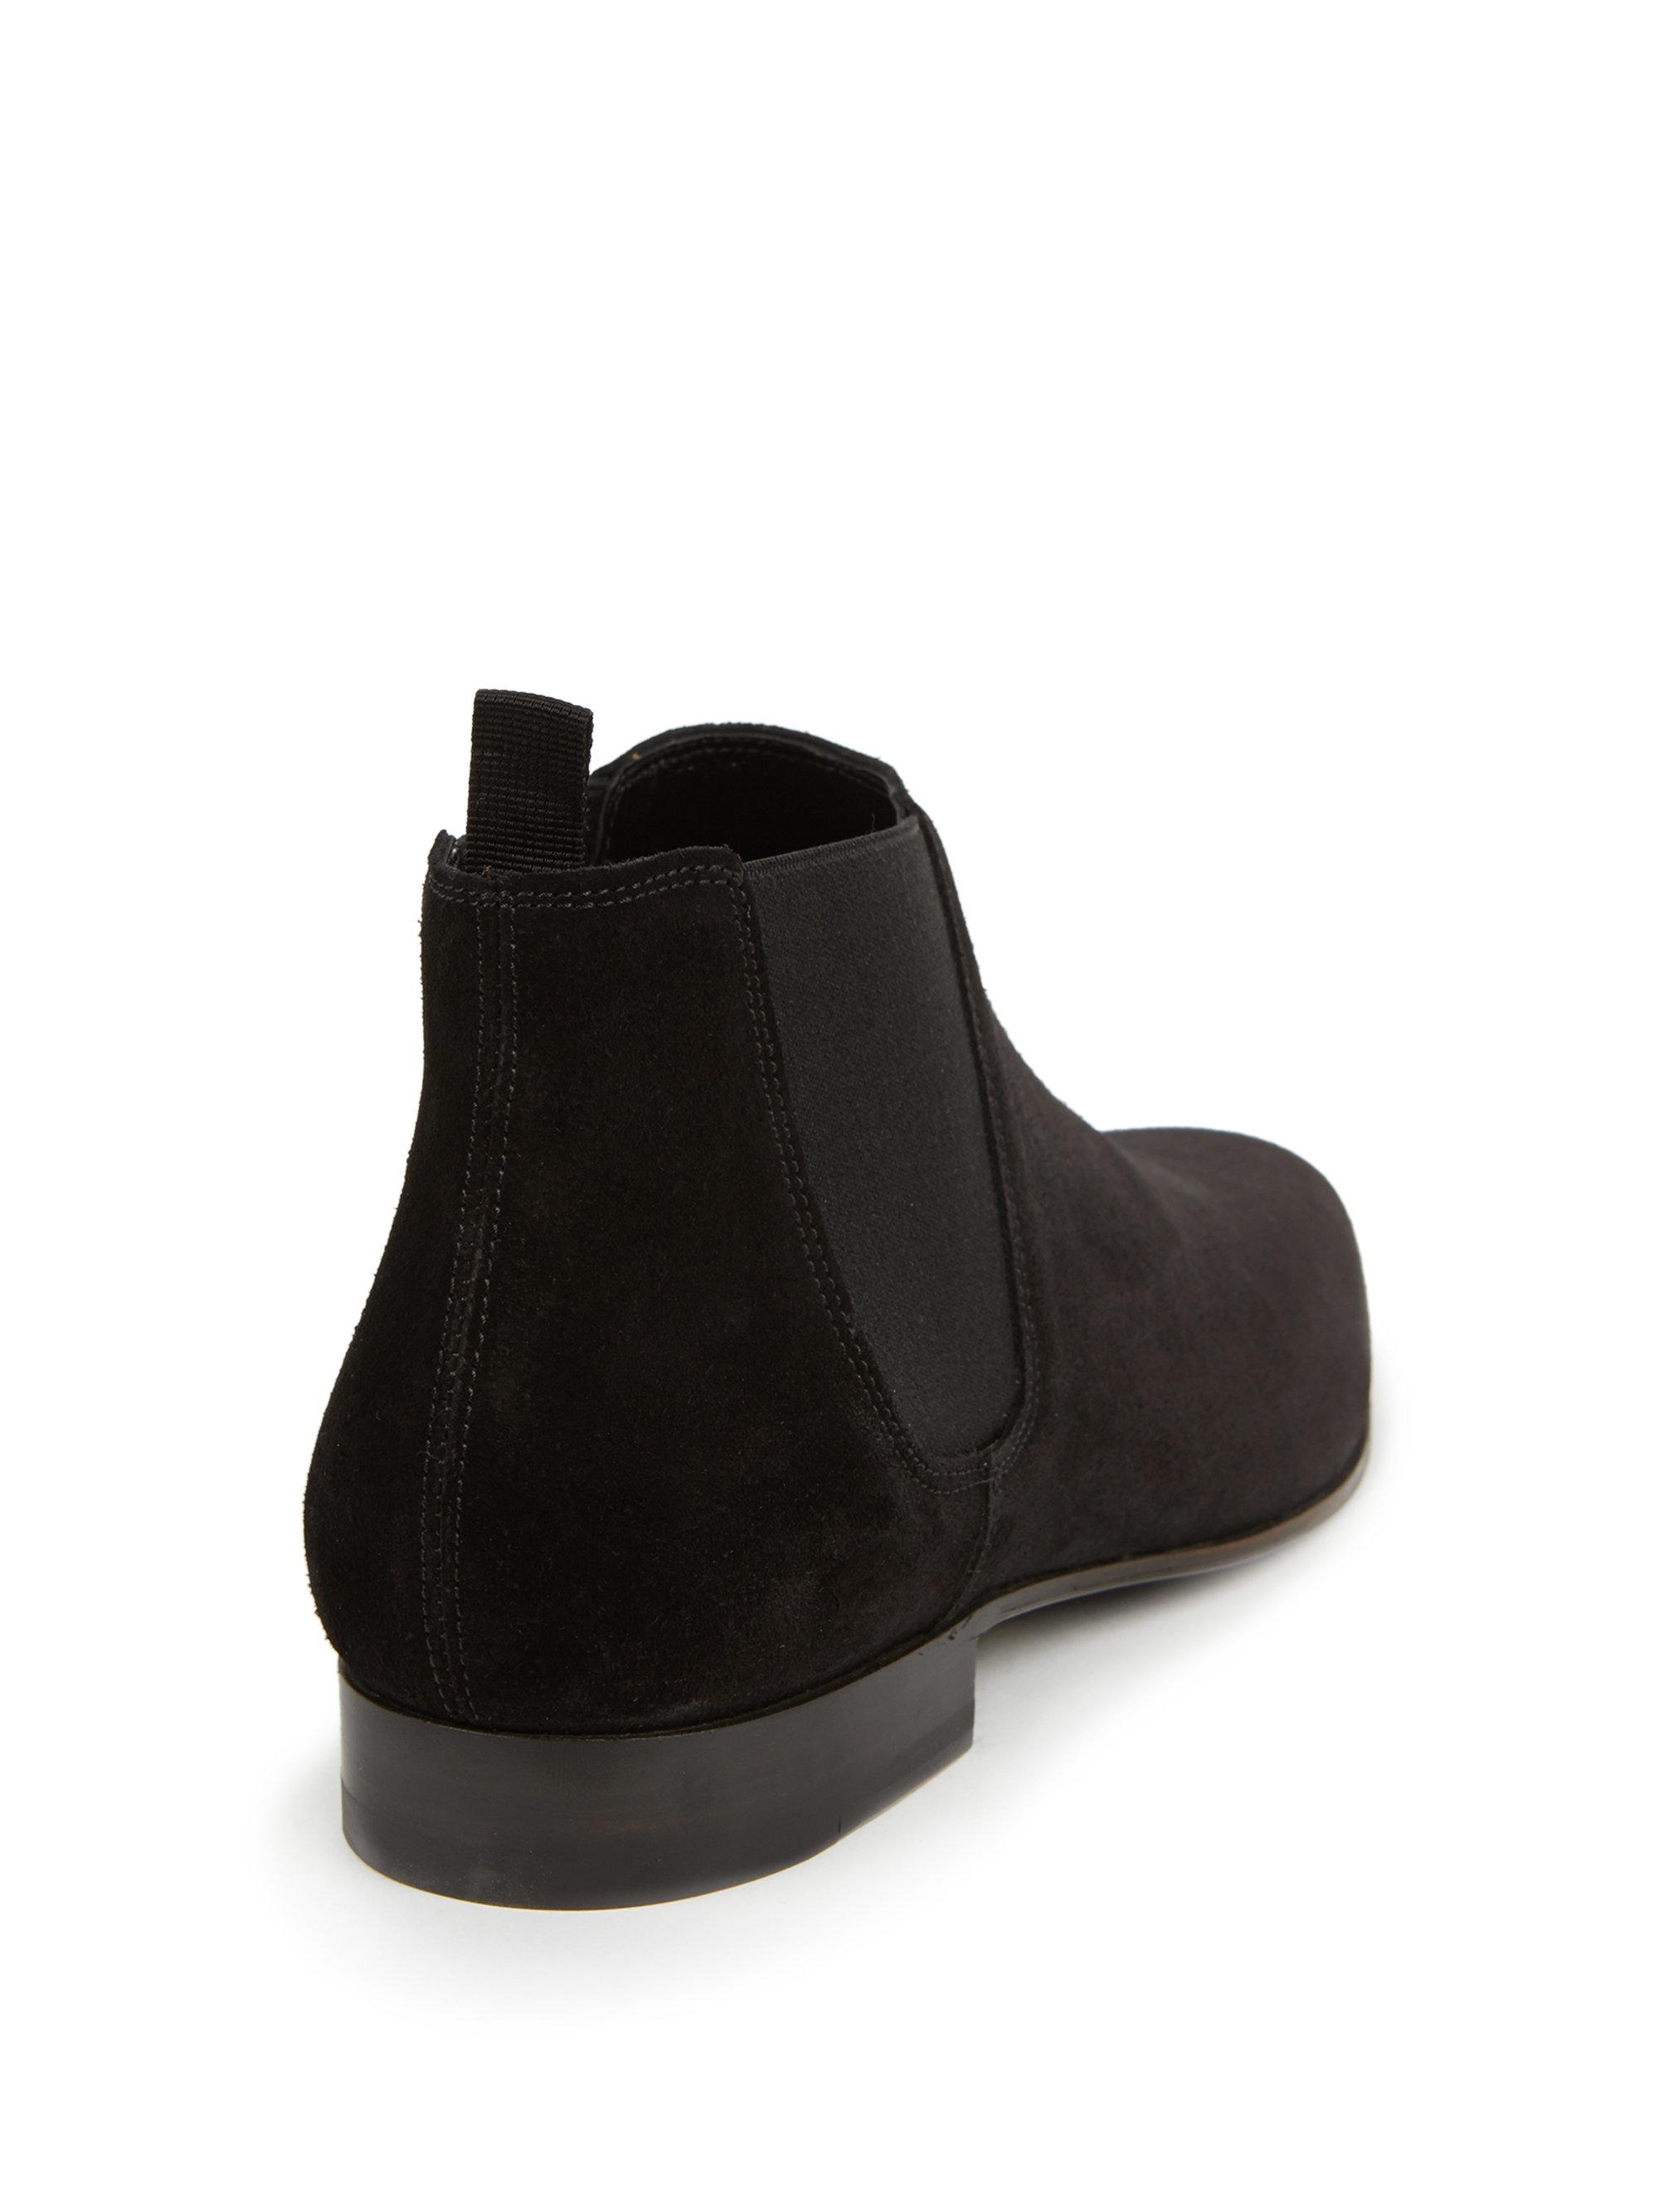 Saint laurent Suede Ankle Boots in Black for Men | Lyst